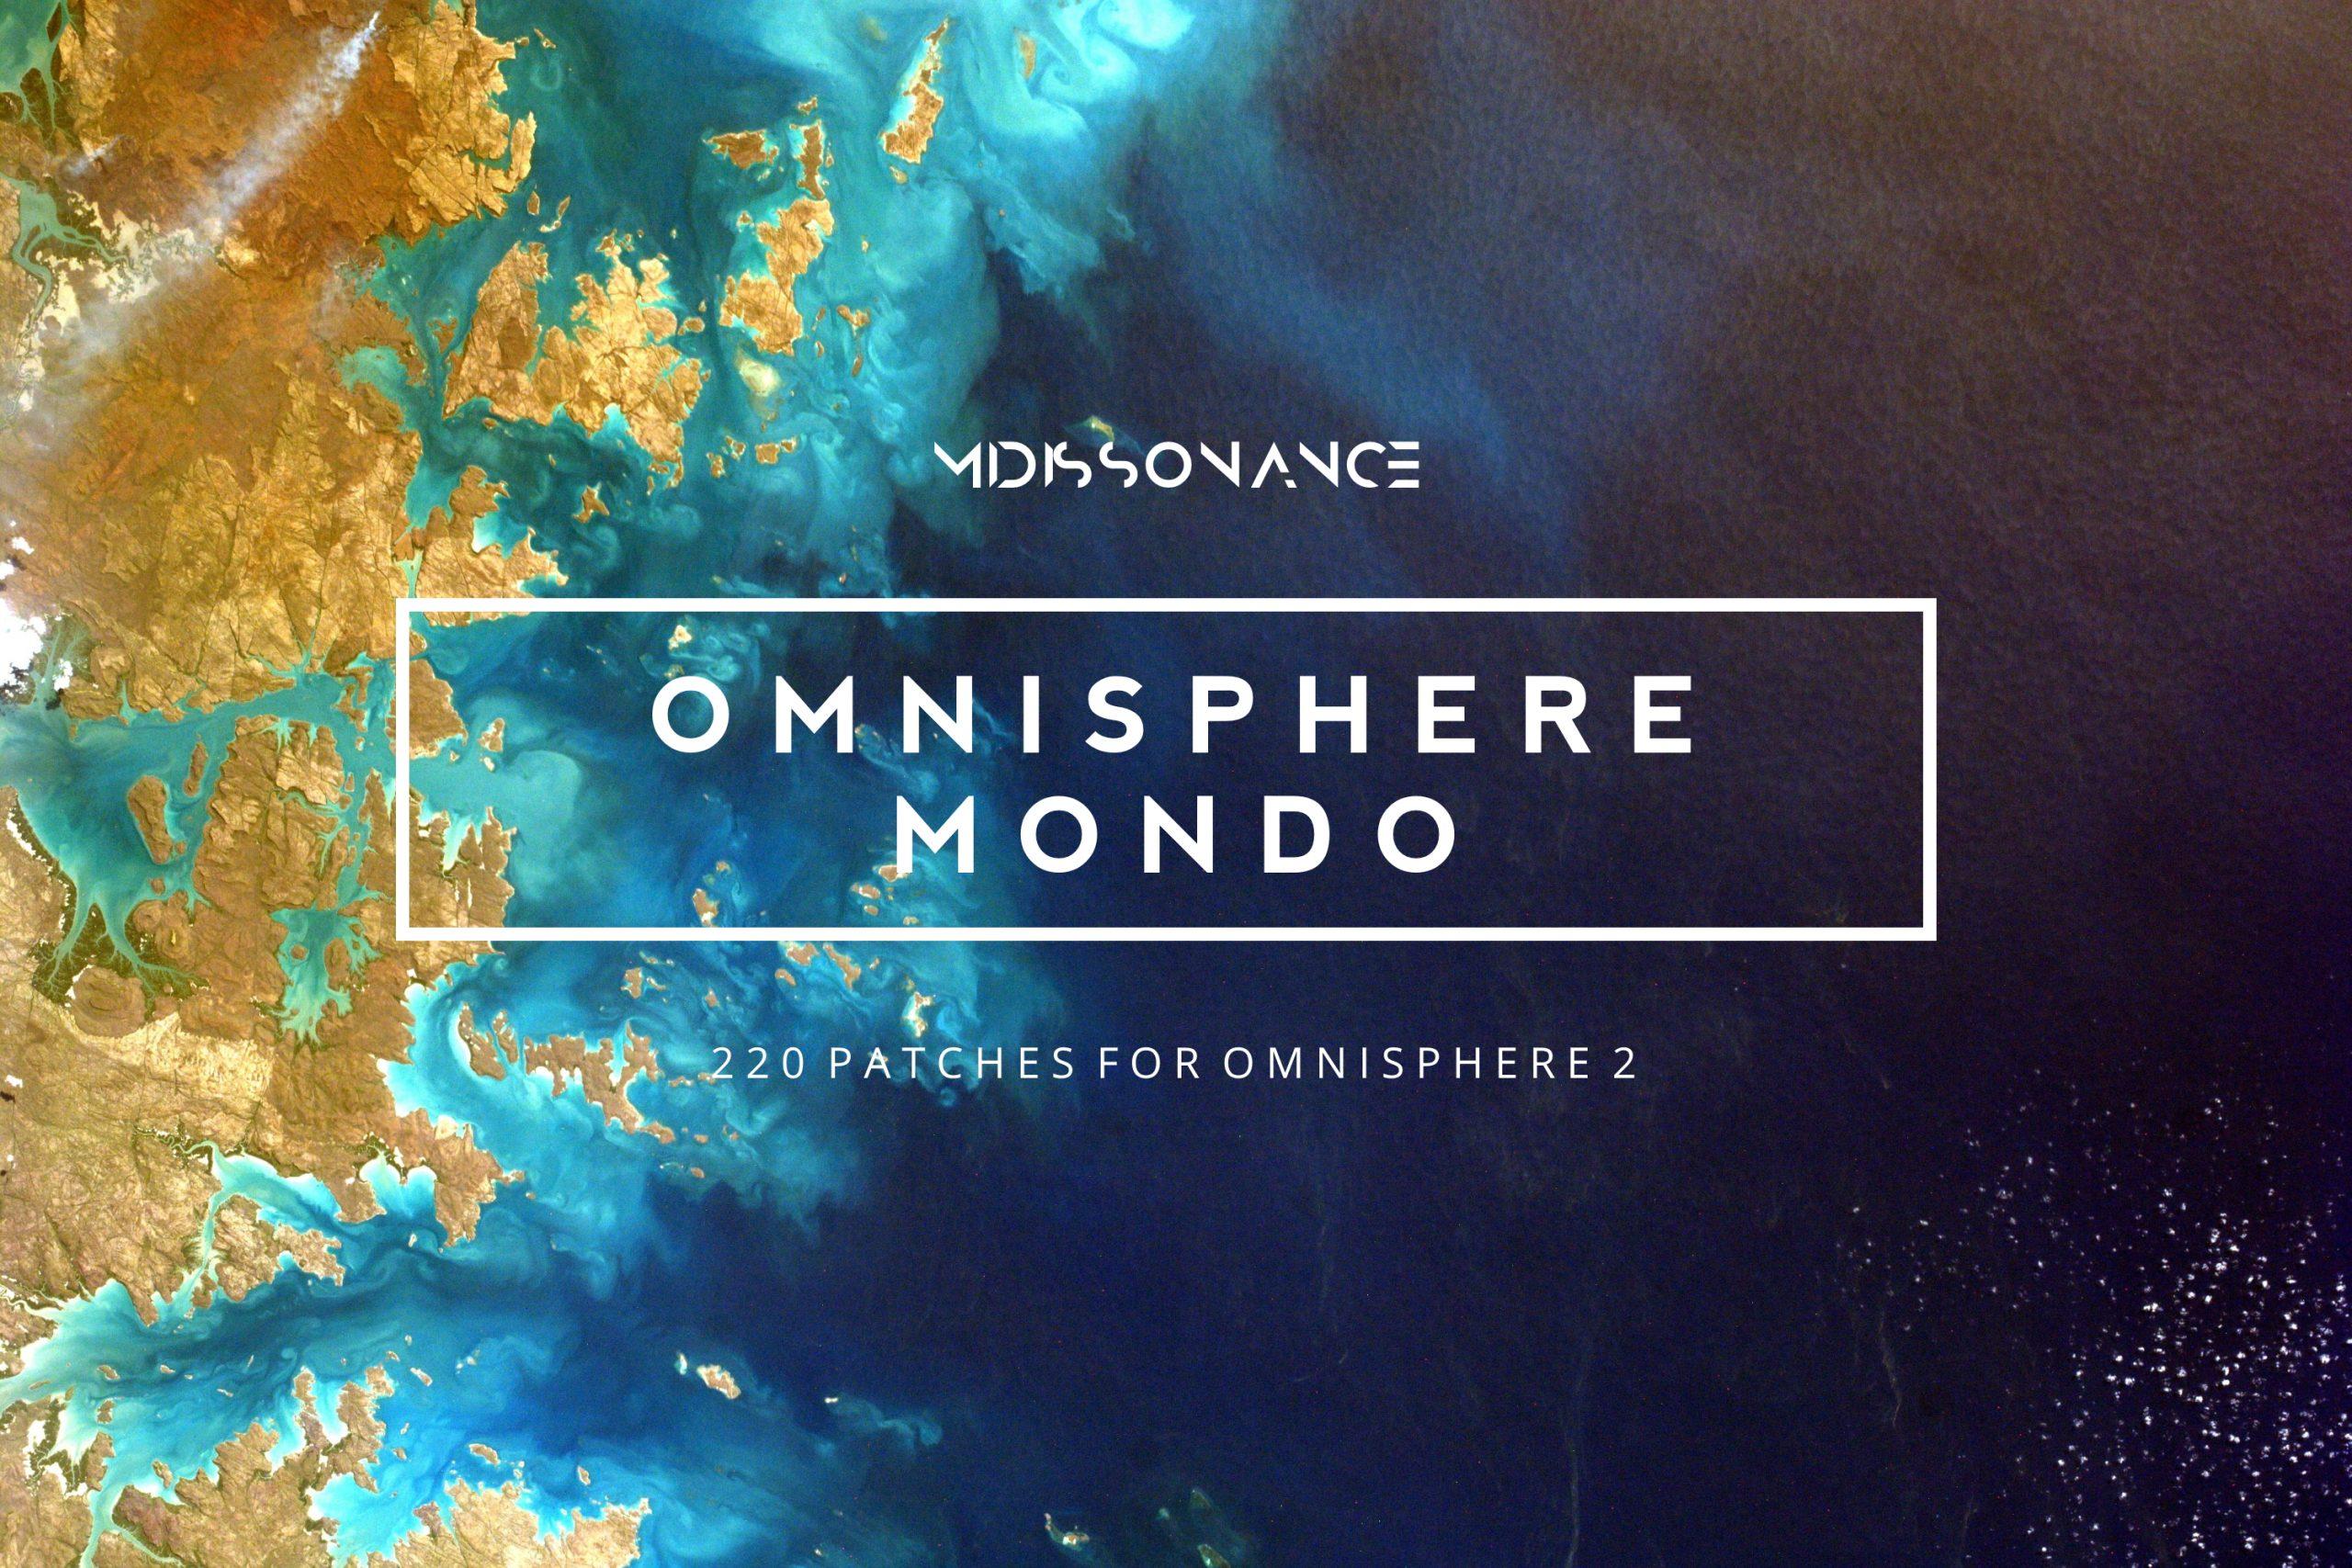 Omnisphere Mondo